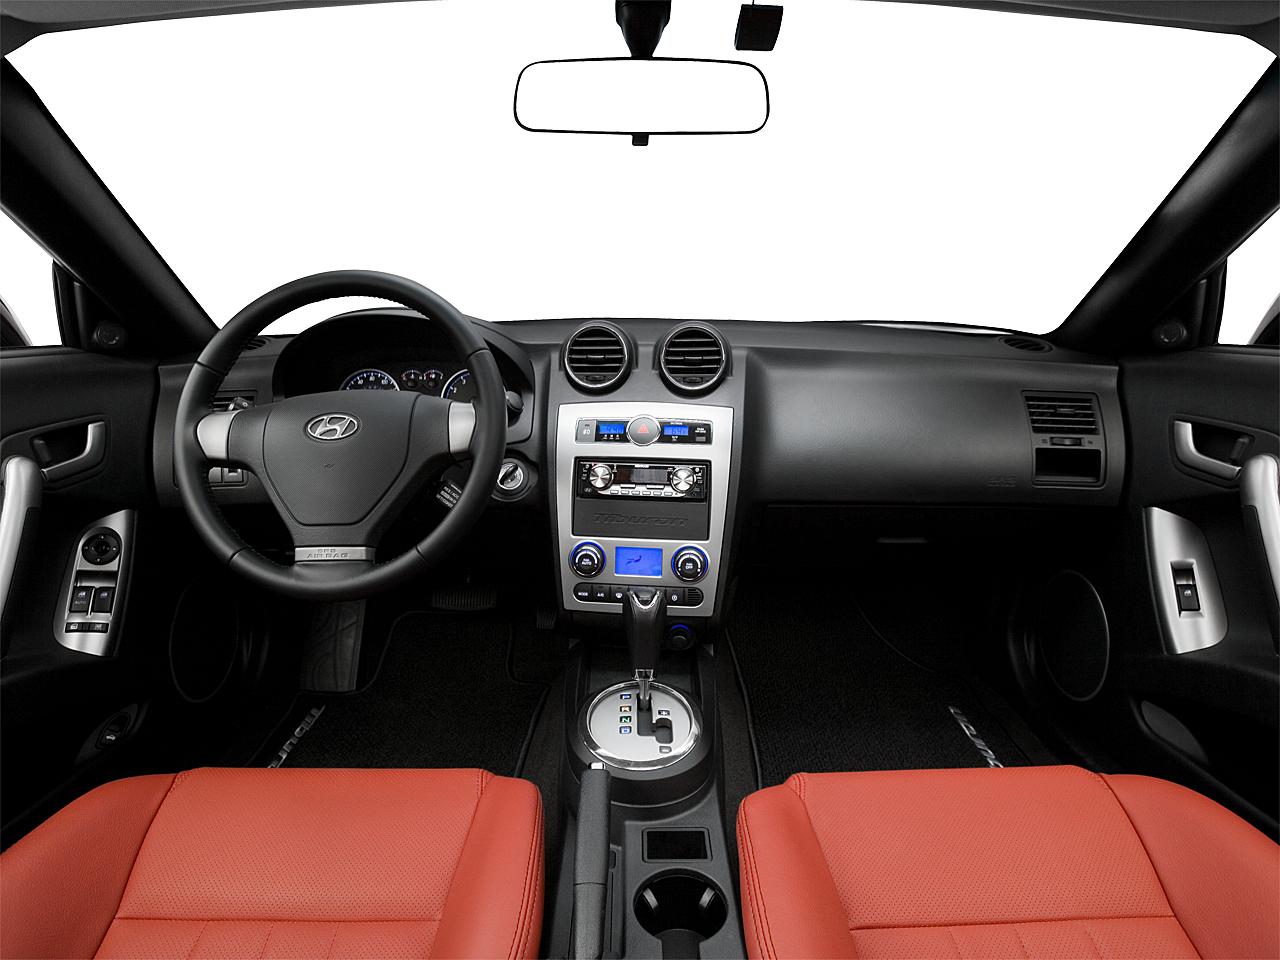 2008 Hyundai Tiburon GT Limited Centered Wide Dash Shot